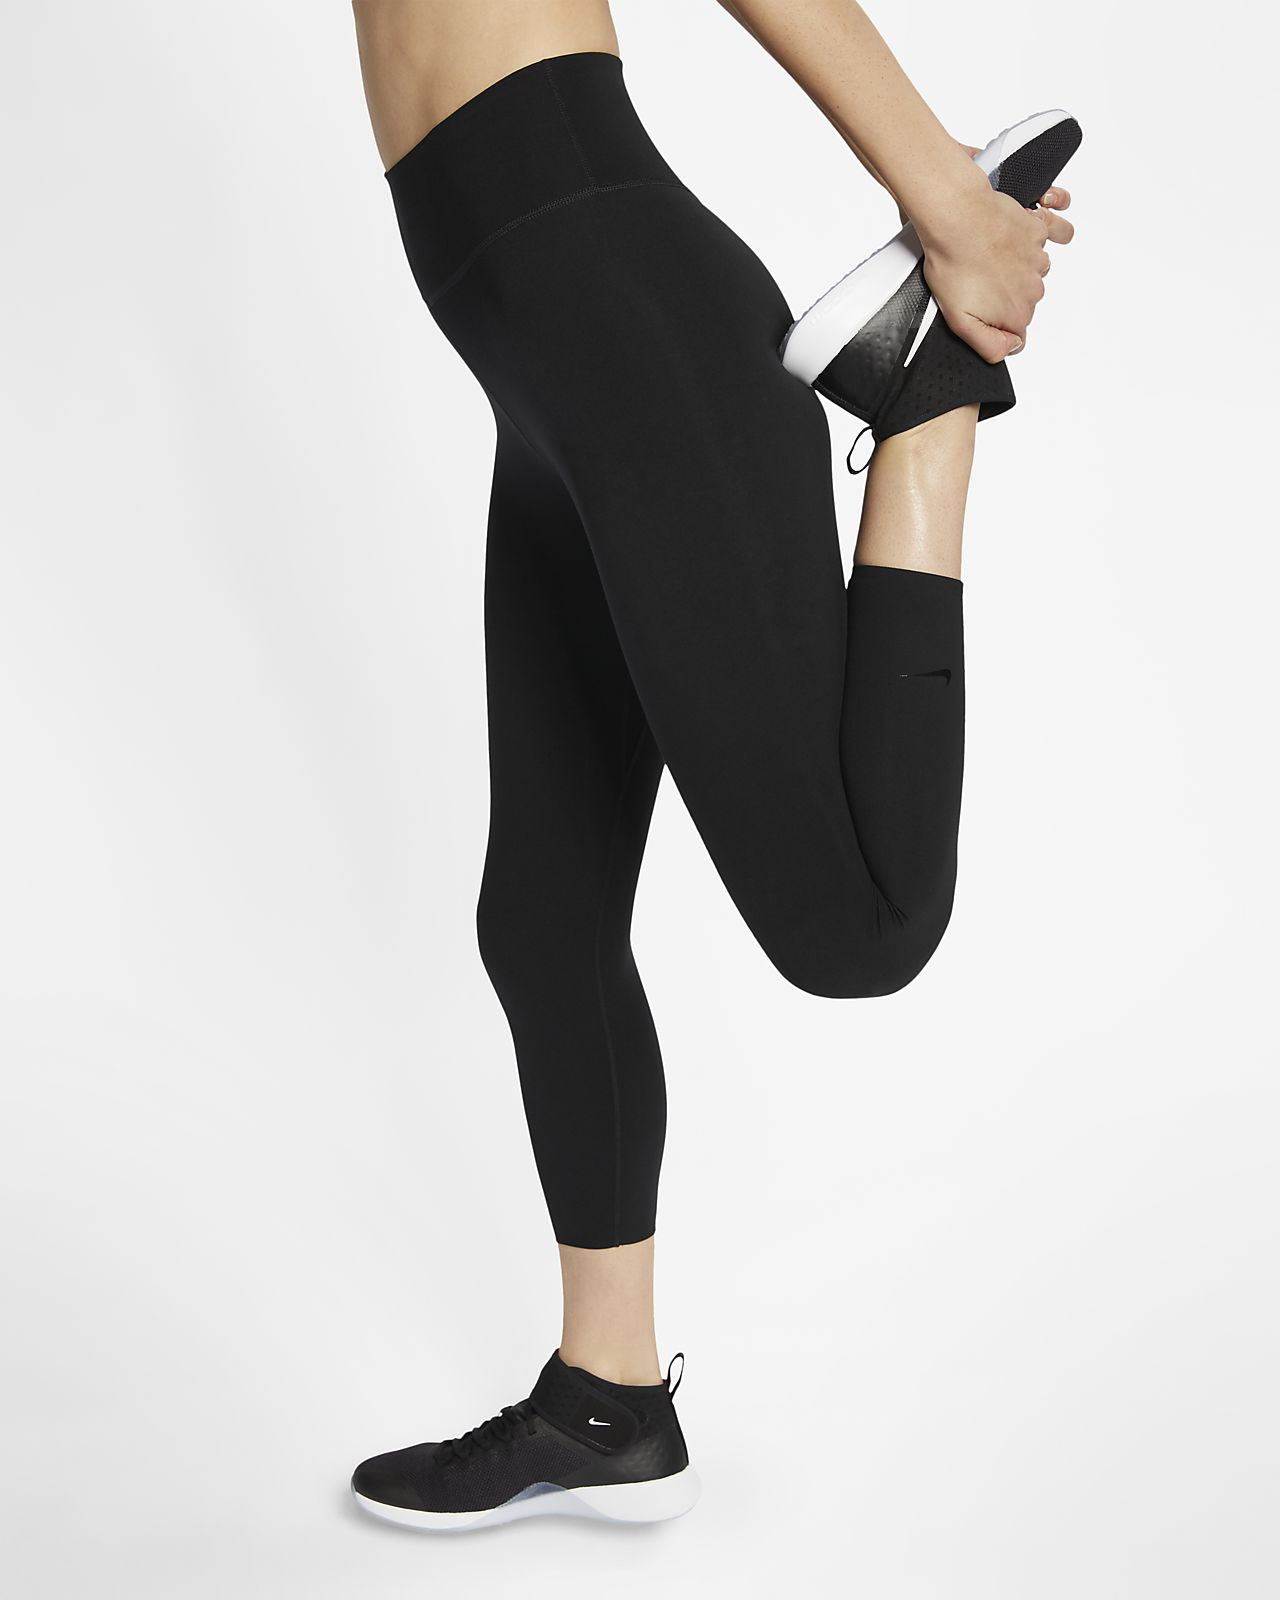 Nike One Luxe Malles de tres quarts - Dona